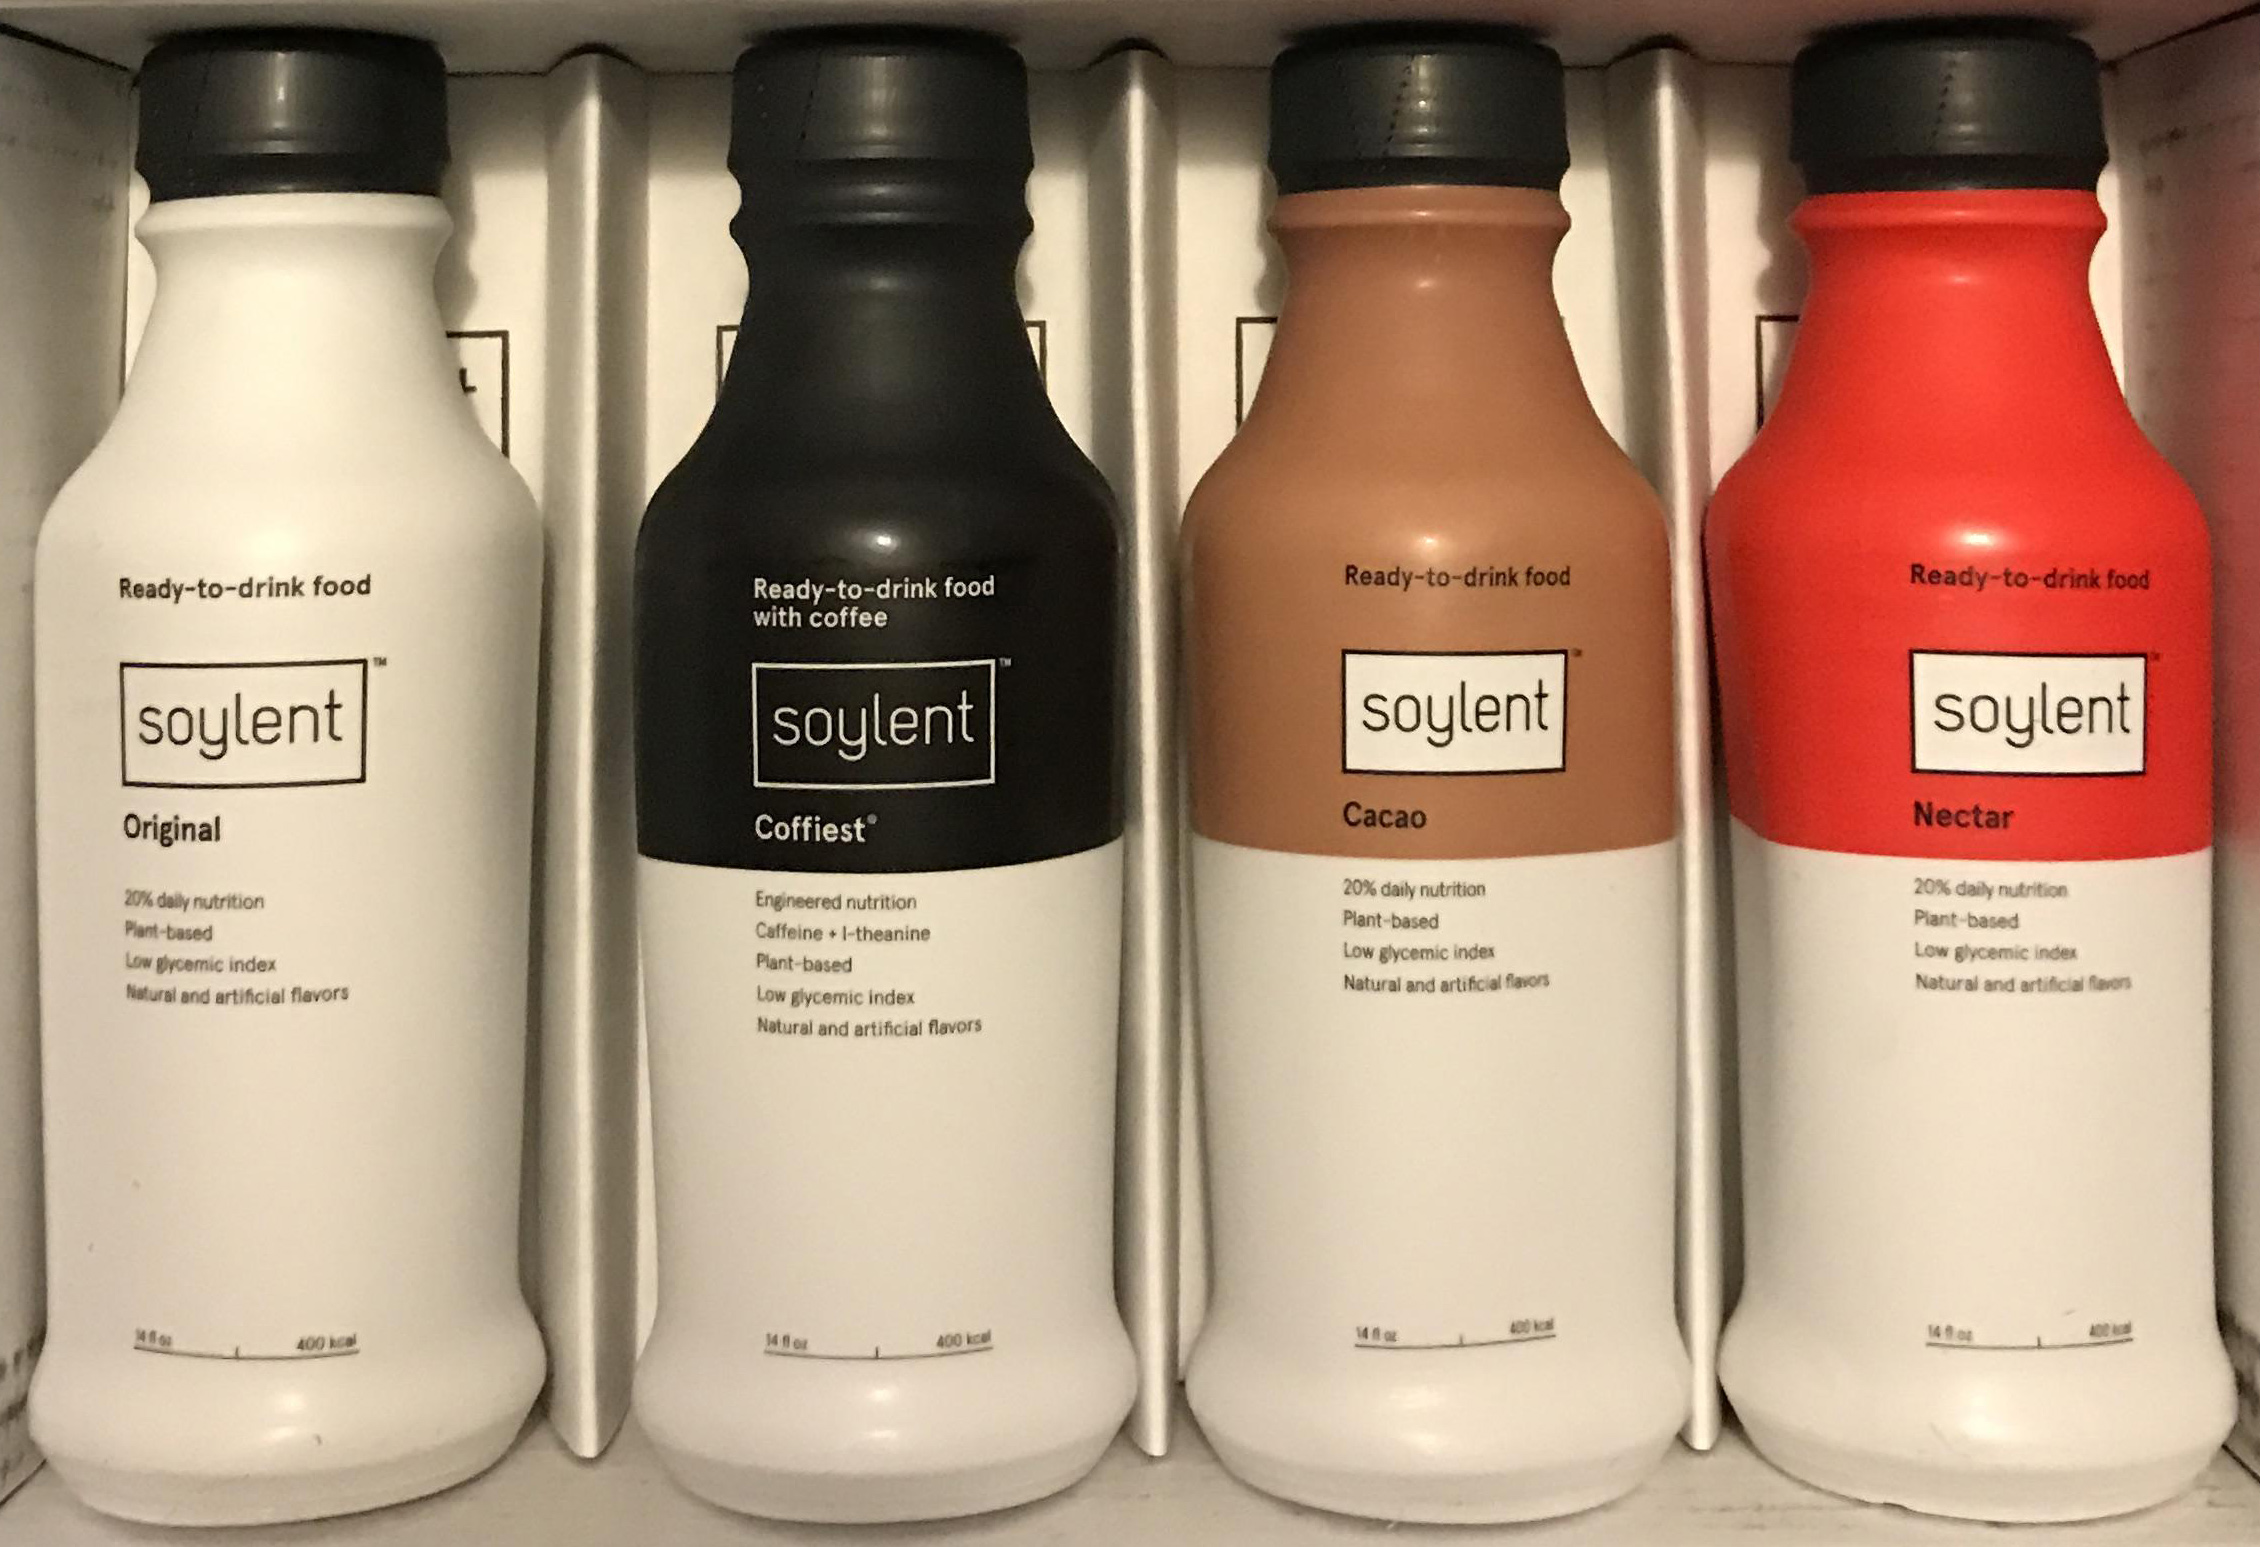 [Image: Soylent-bottles-close.jpg]